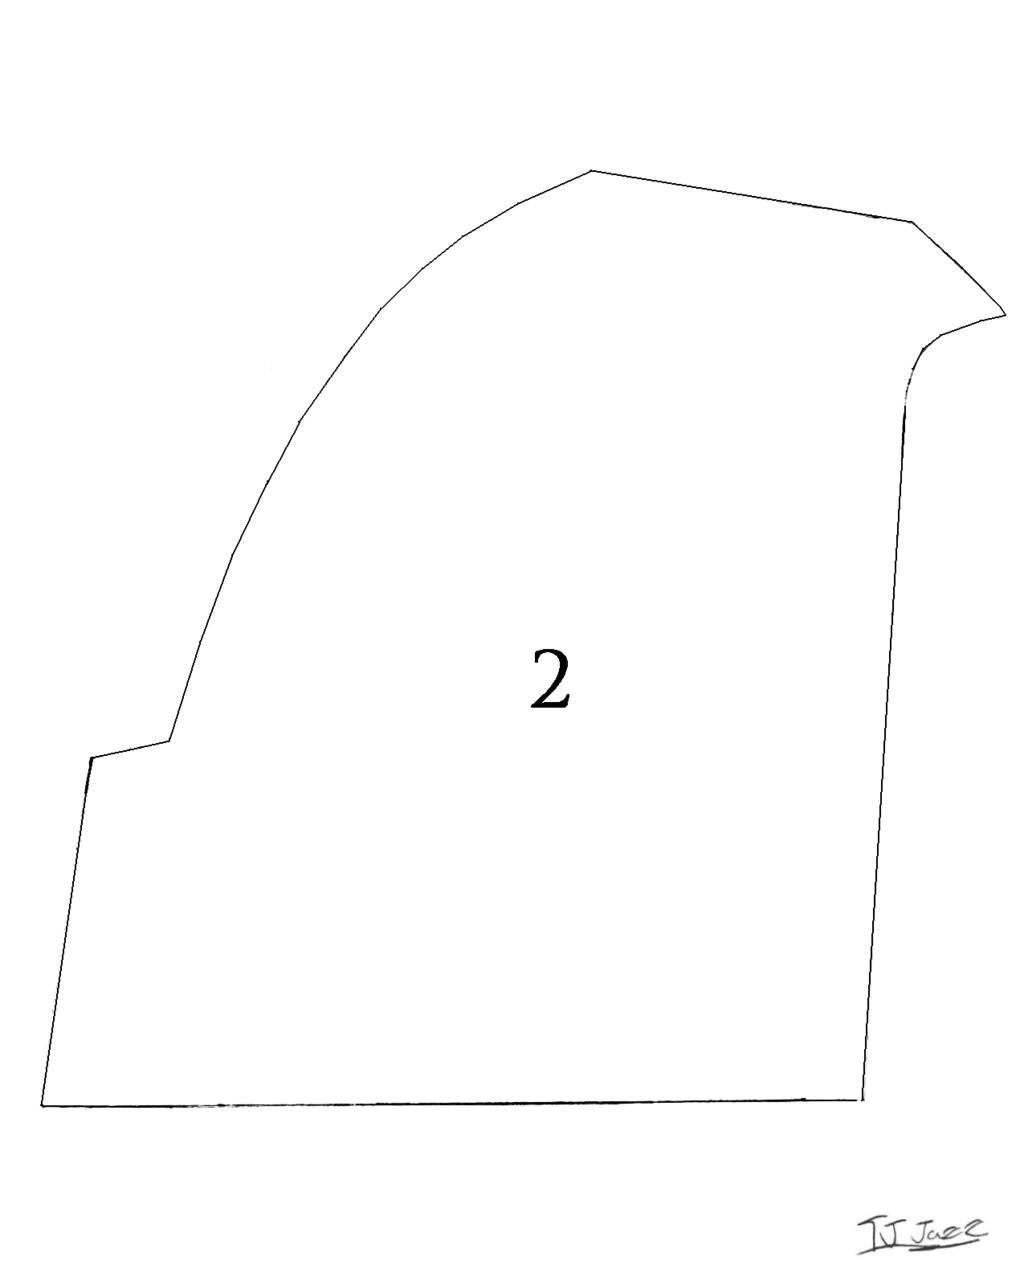 darth vader helmet templates part 2 659676965 ga submit new 10 3a1485461168